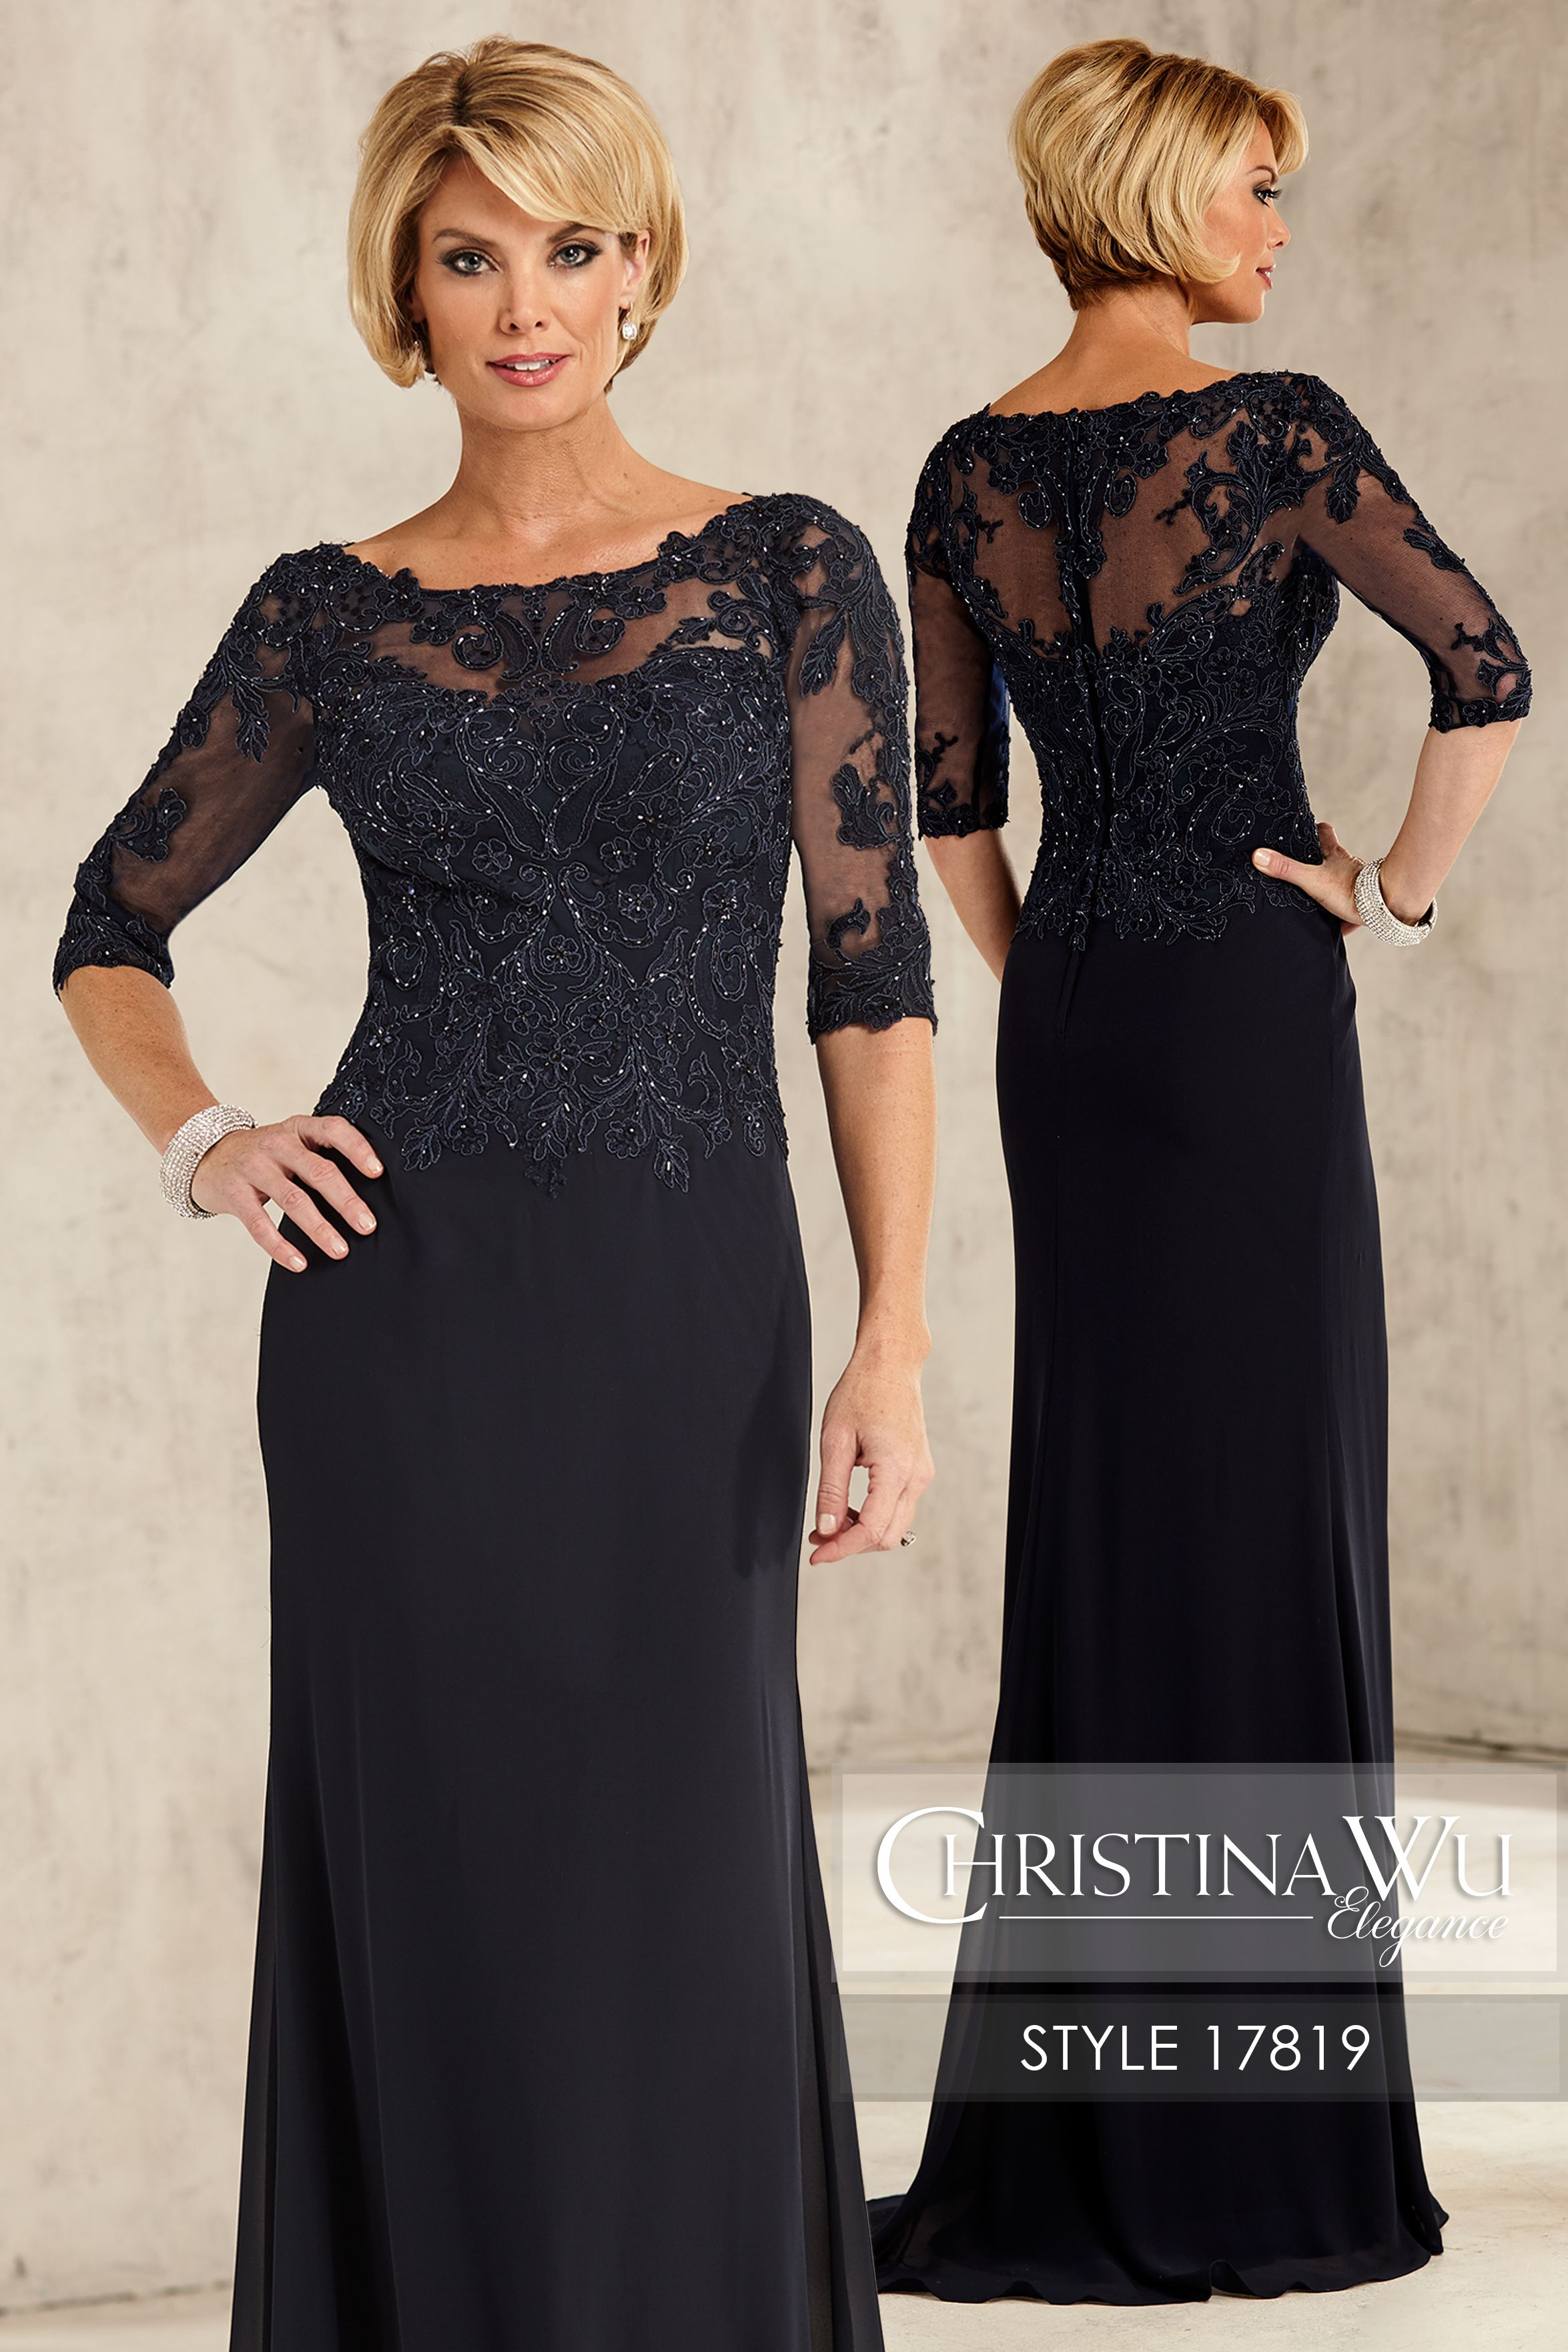 f5a3371d645 ChristinaWuElegance Style 17819 Illusion bateau neckline